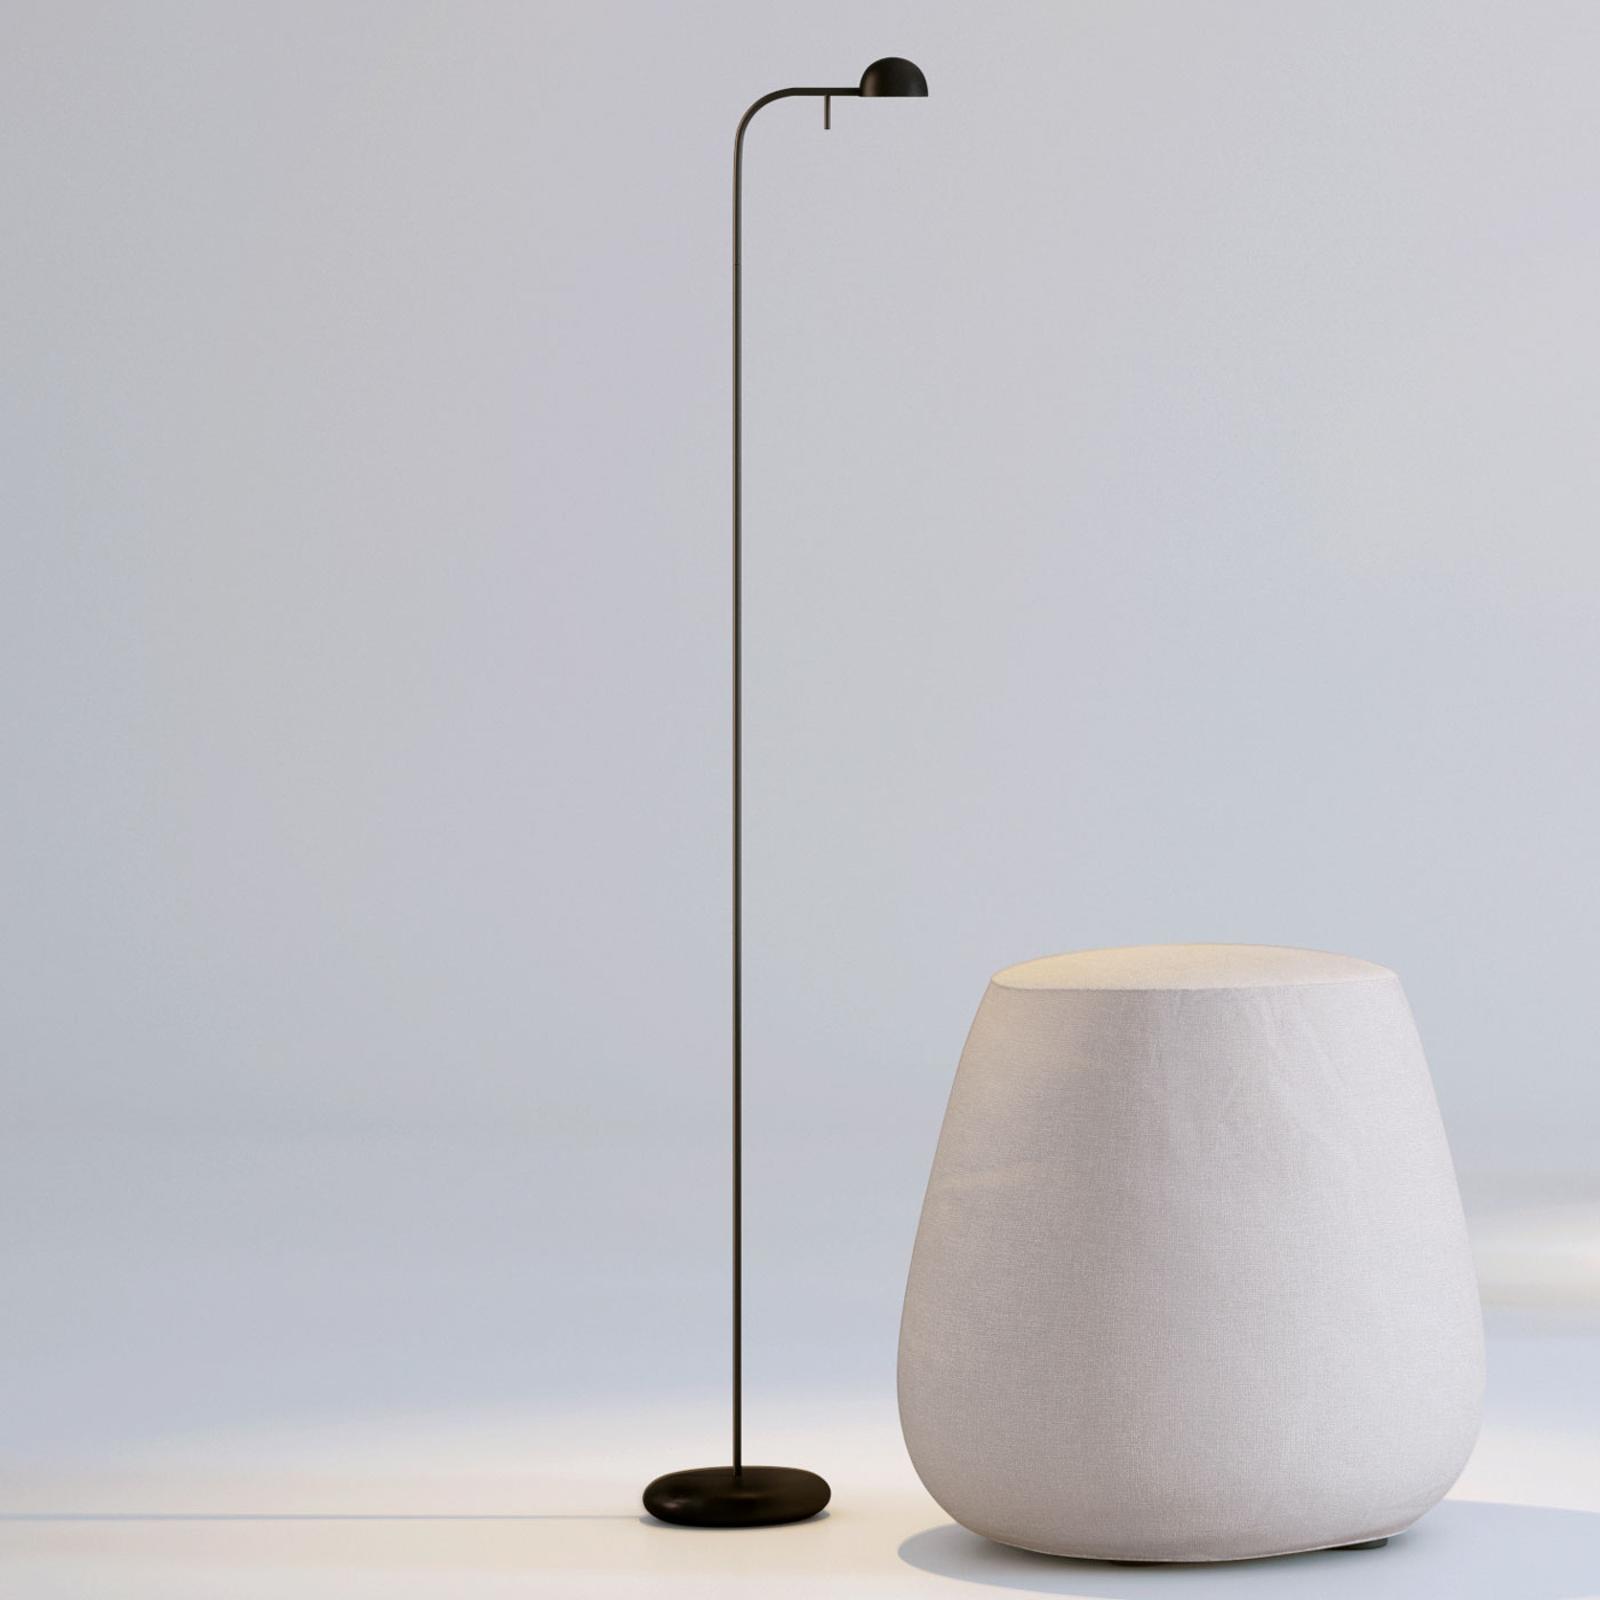 Vibia Pin 1660 LED-lattiavalaisin, 125 cm, musta